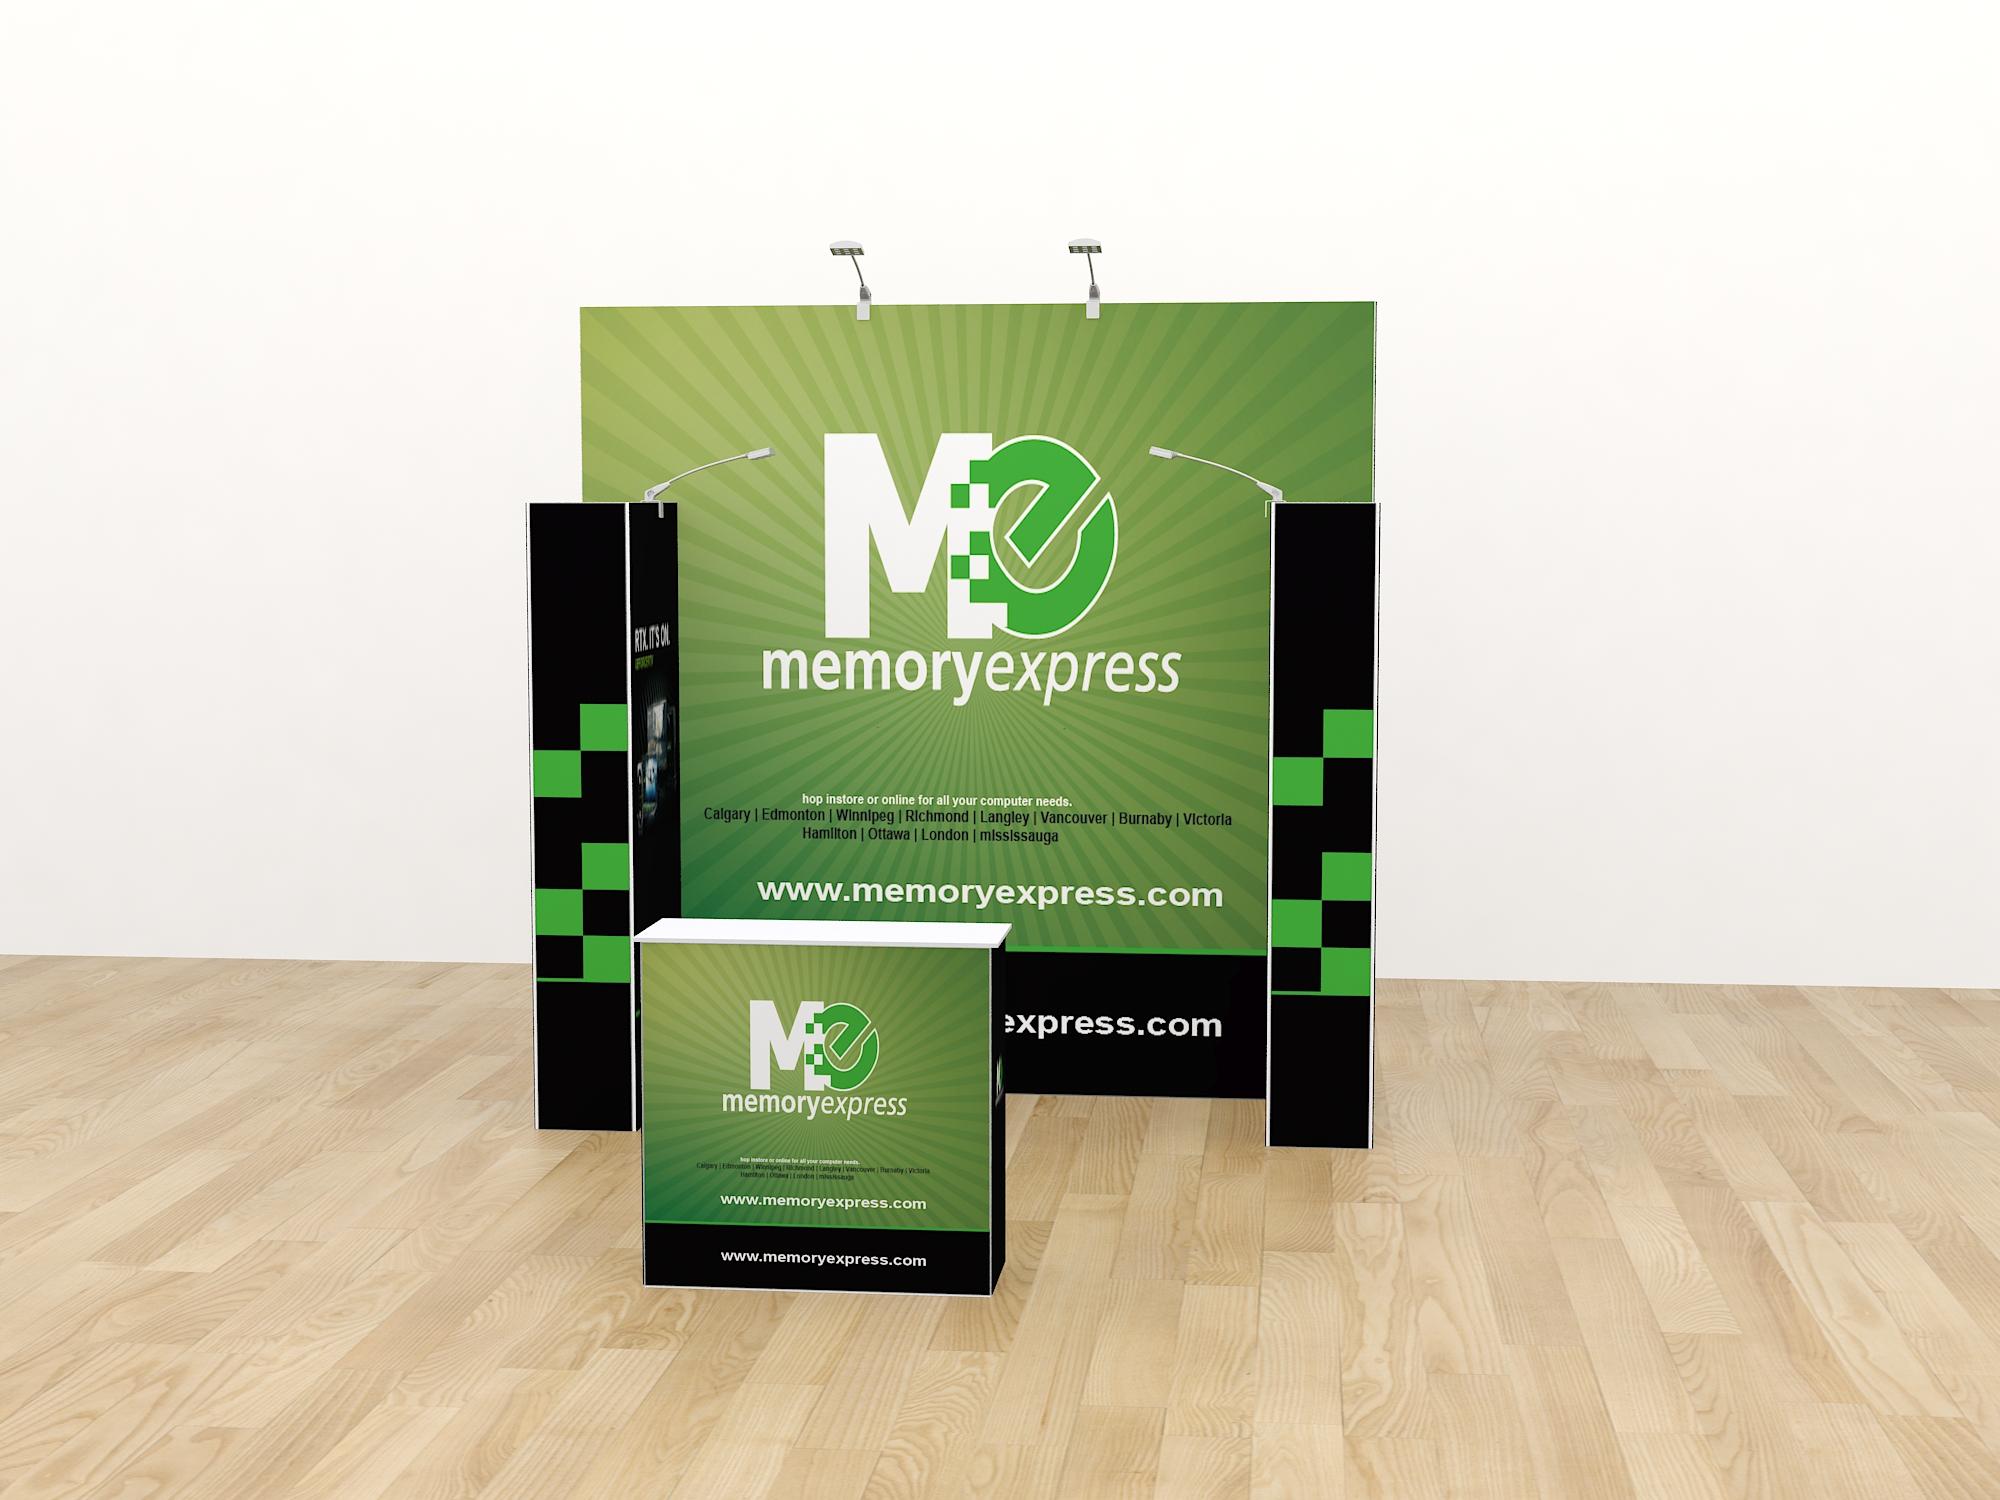 Reusable tension fabric display booth